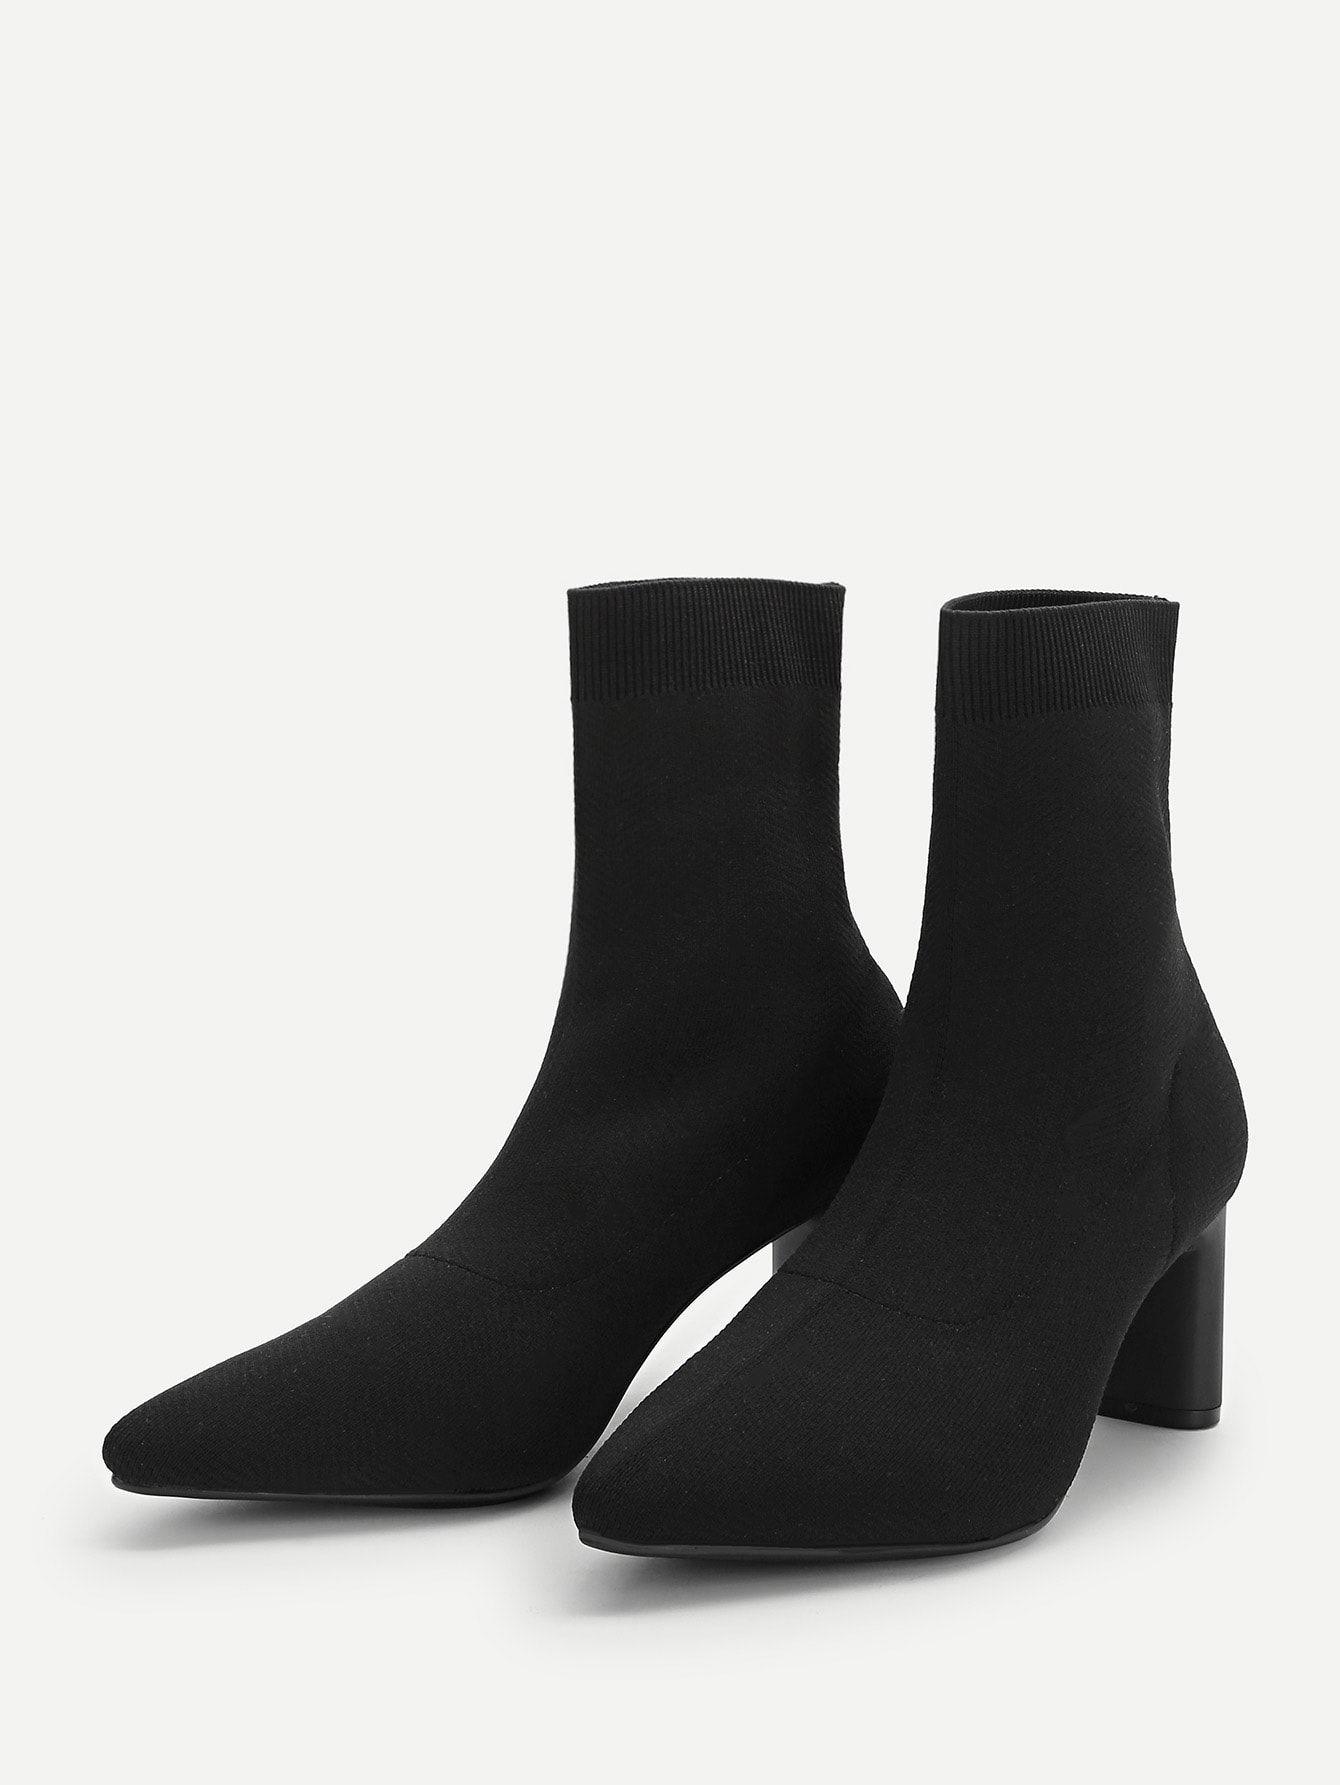 0a1b4b7dfd Elegant Plain Ankle No zipper Black Mid Heel Chunky Point Toe Sock Boots